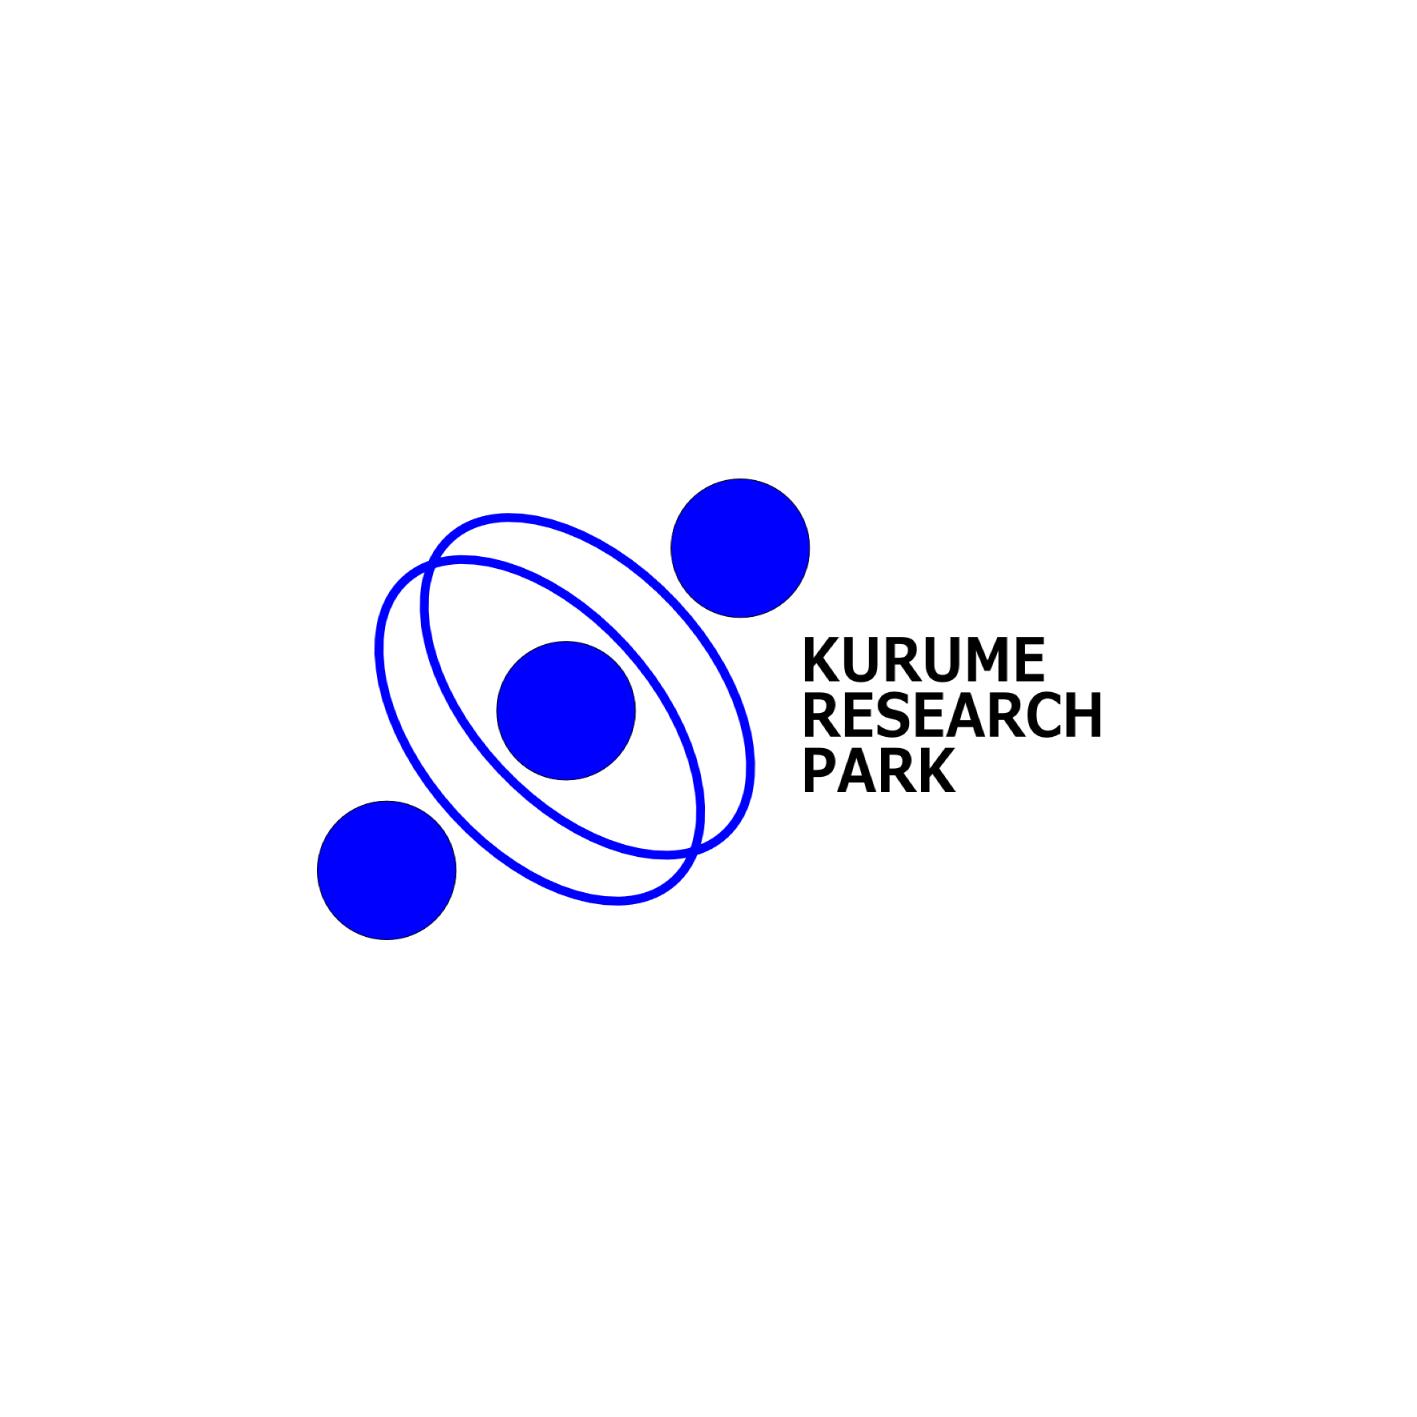 Kurume Research Park Co., Ltd.